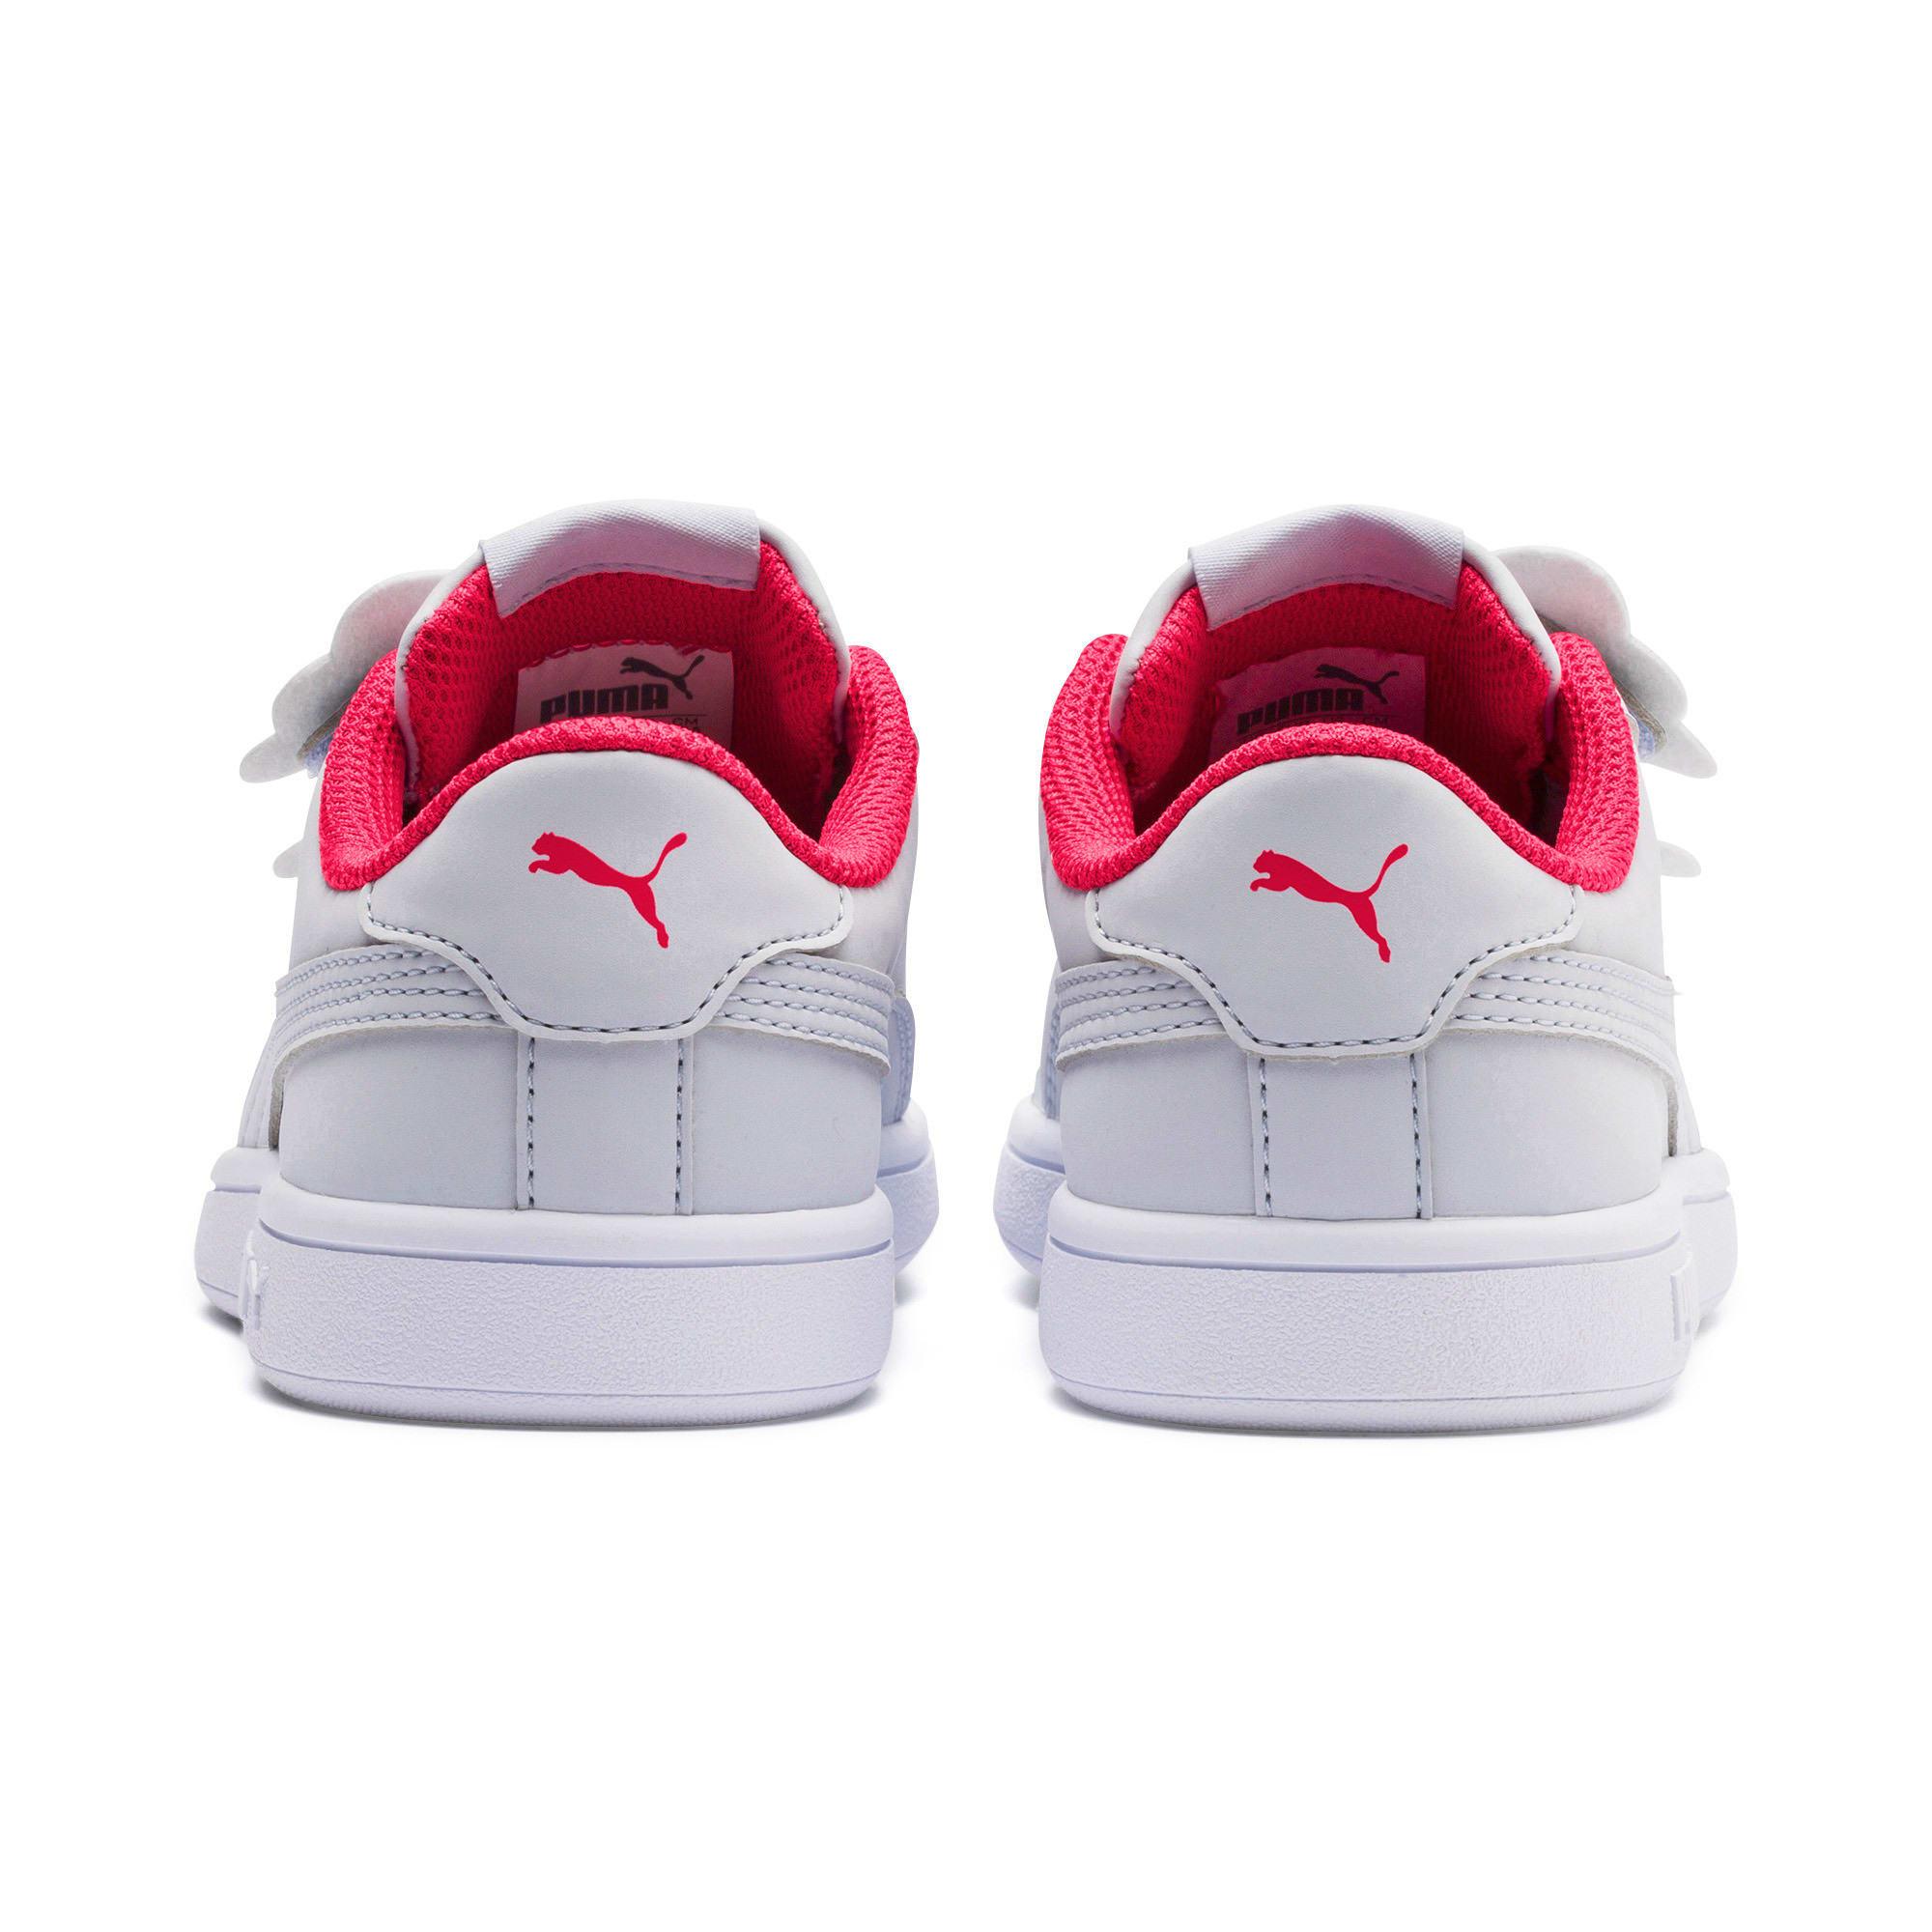 Thumbnail 3 of Puma Smash v2 Butterfly Little Kids' Shoes, Heather-Nrgy Rose-Puma White, medium